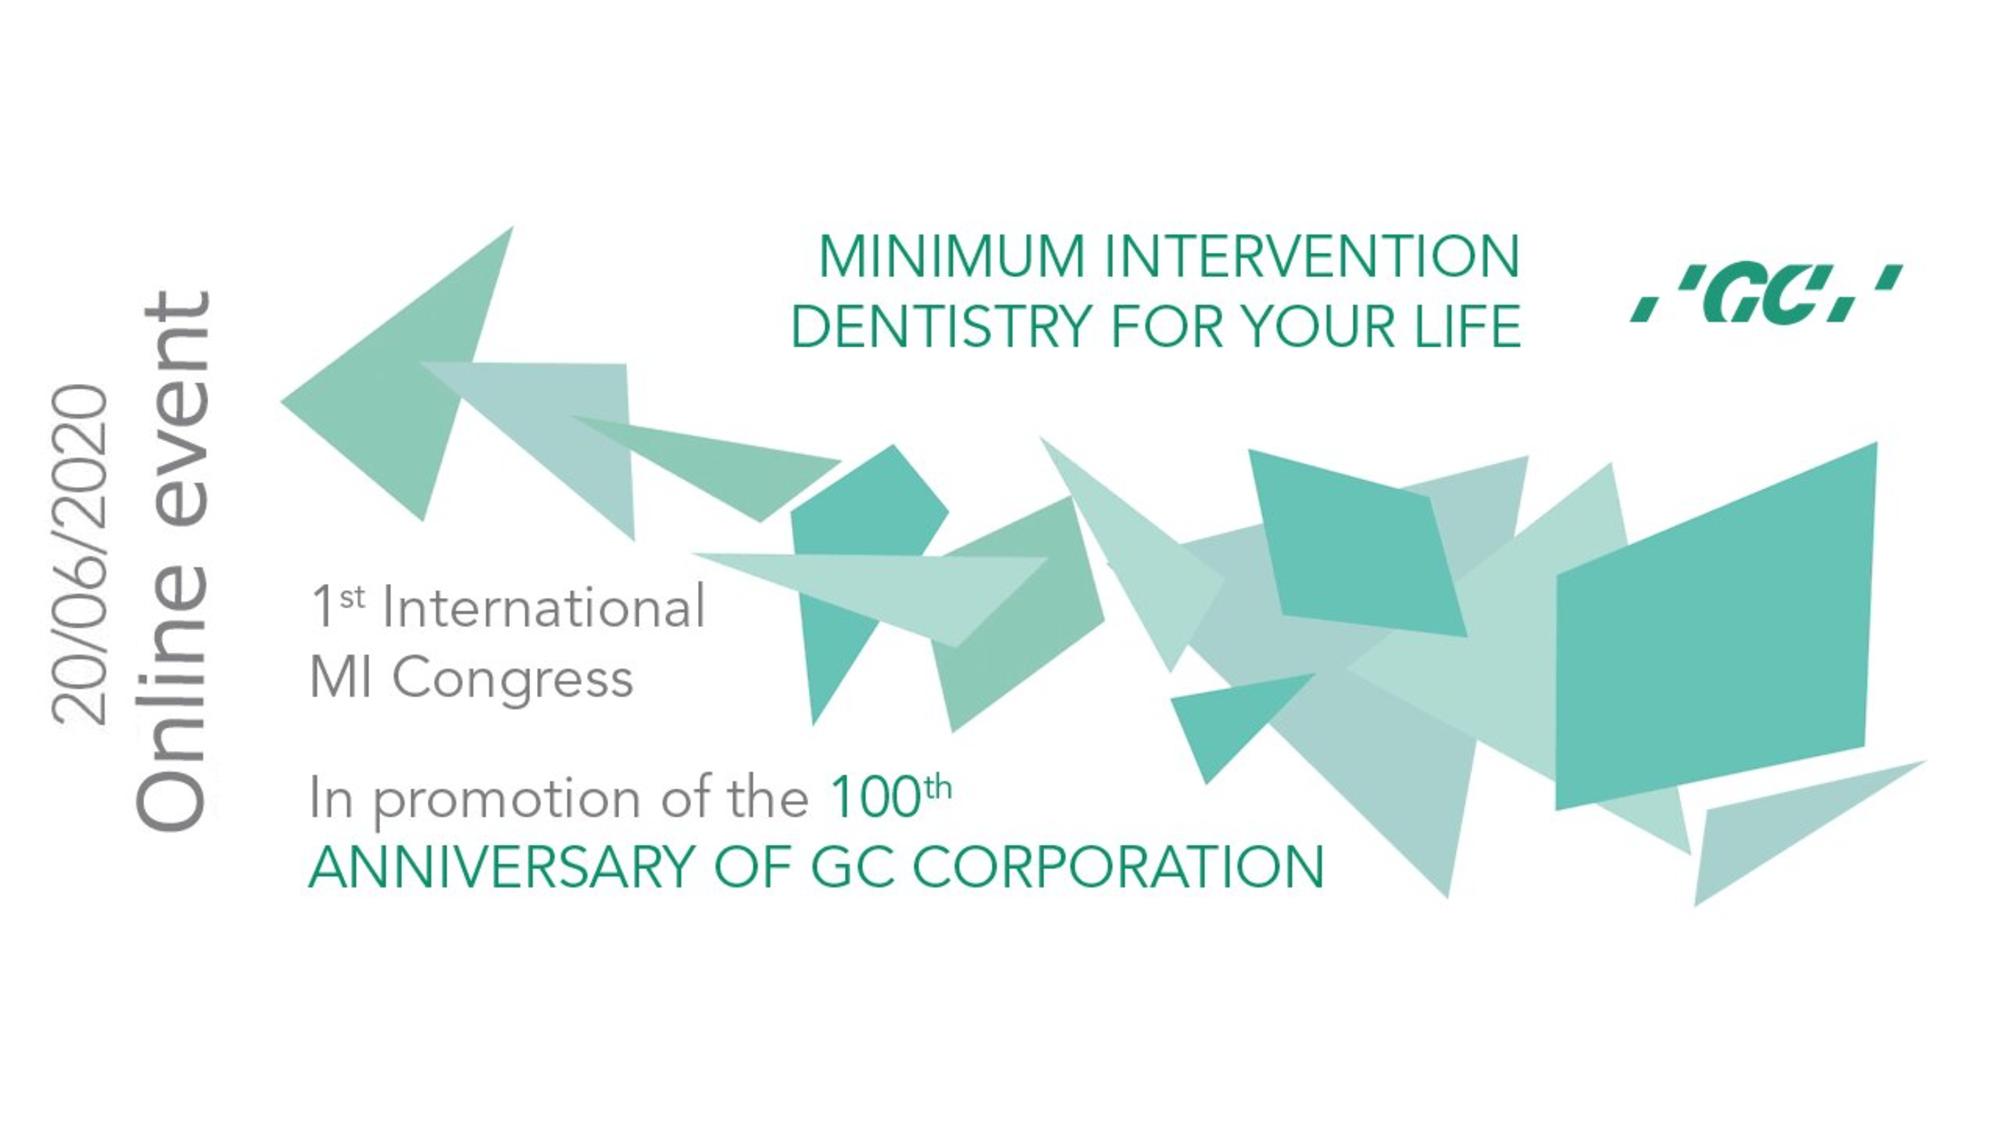 1st International MI Congress